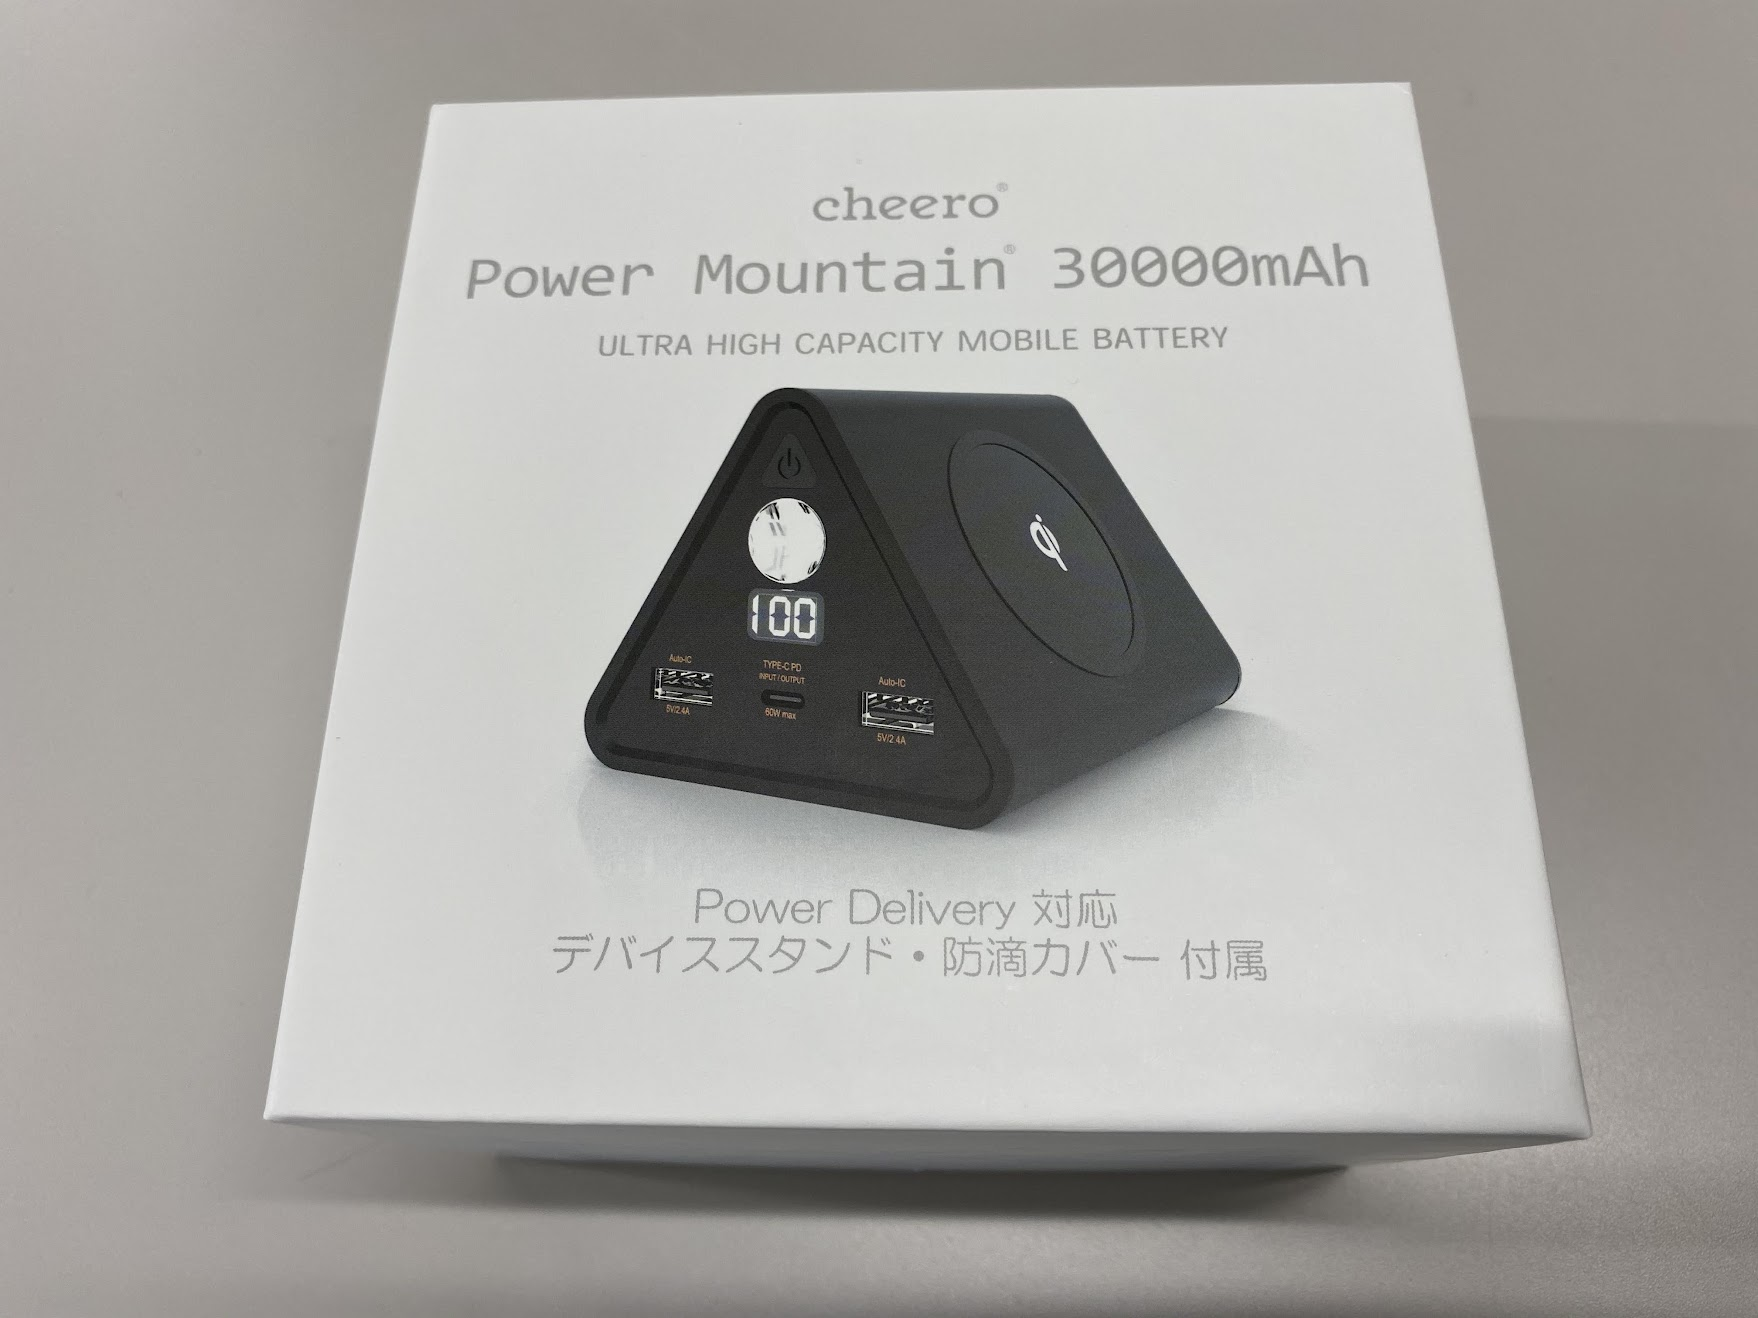 Power Mountain 30000mAh 外箱